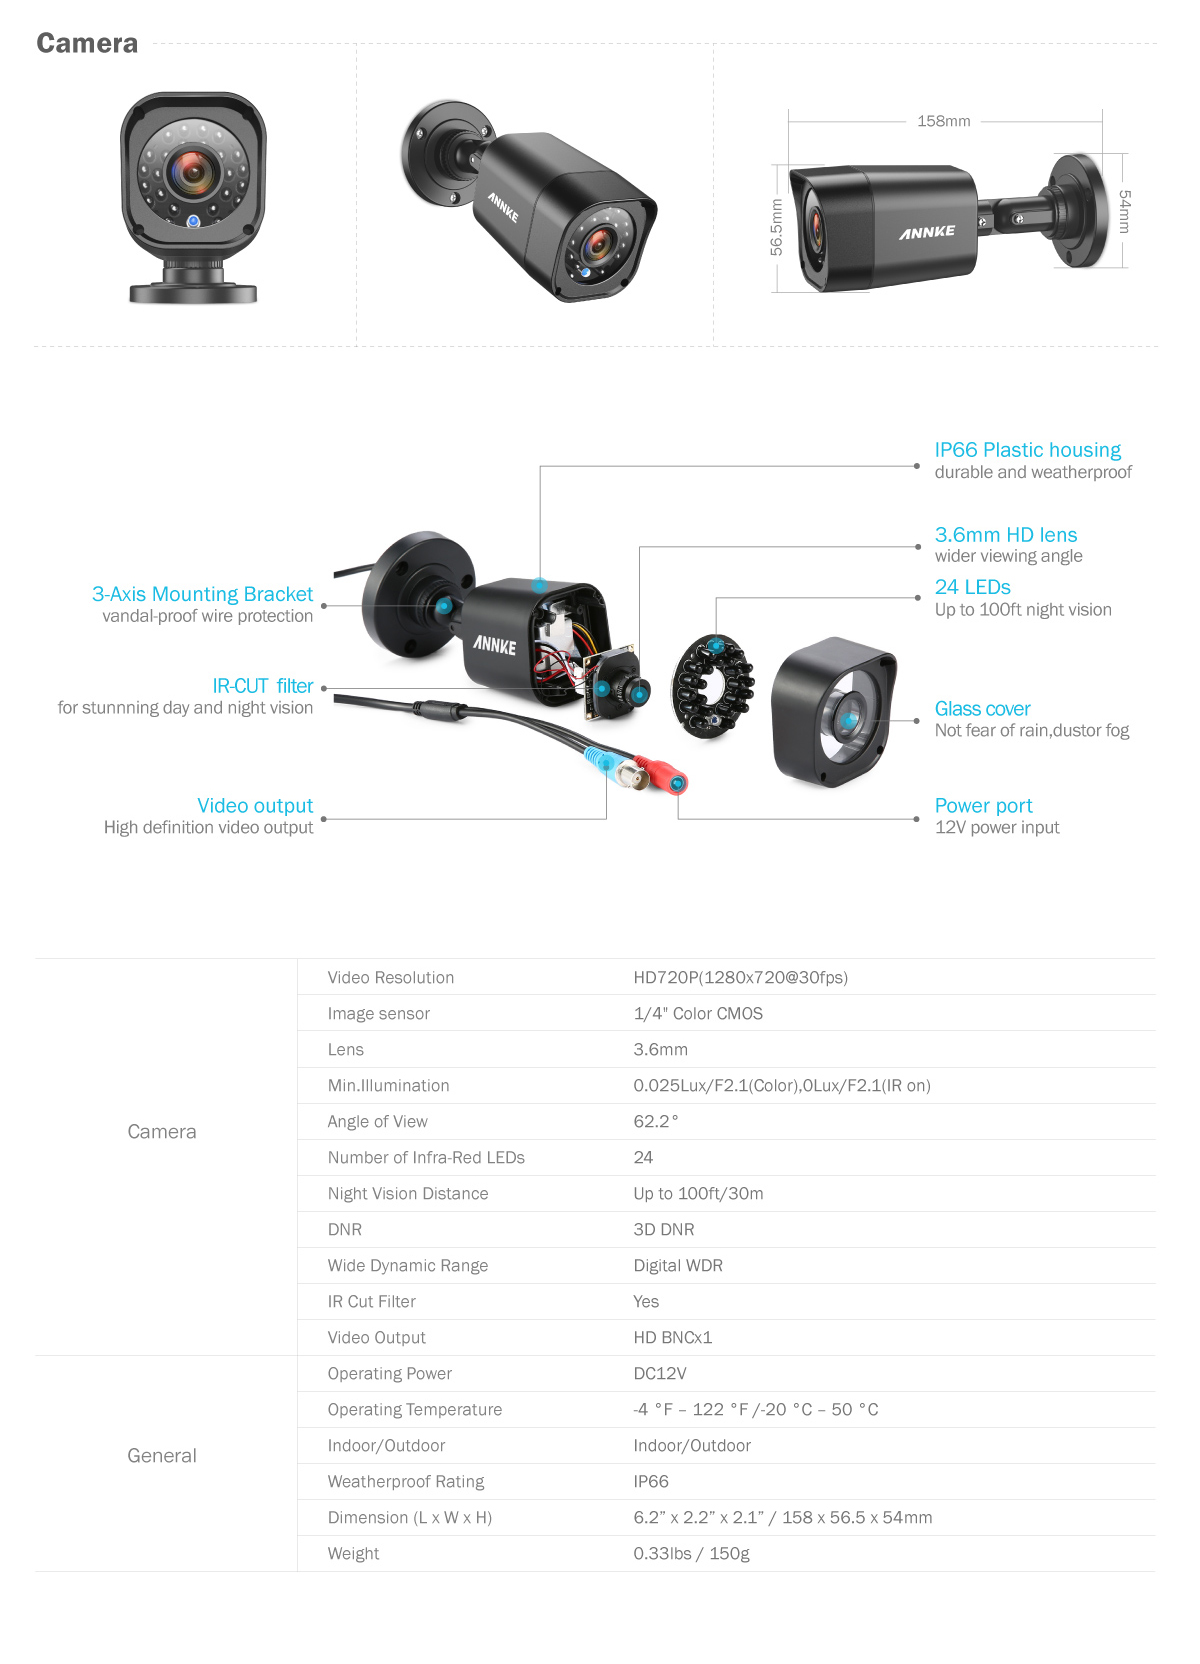 Annke 4x Tvl 720p Cctv Camera In Outdoor Ir Security Surveillance System